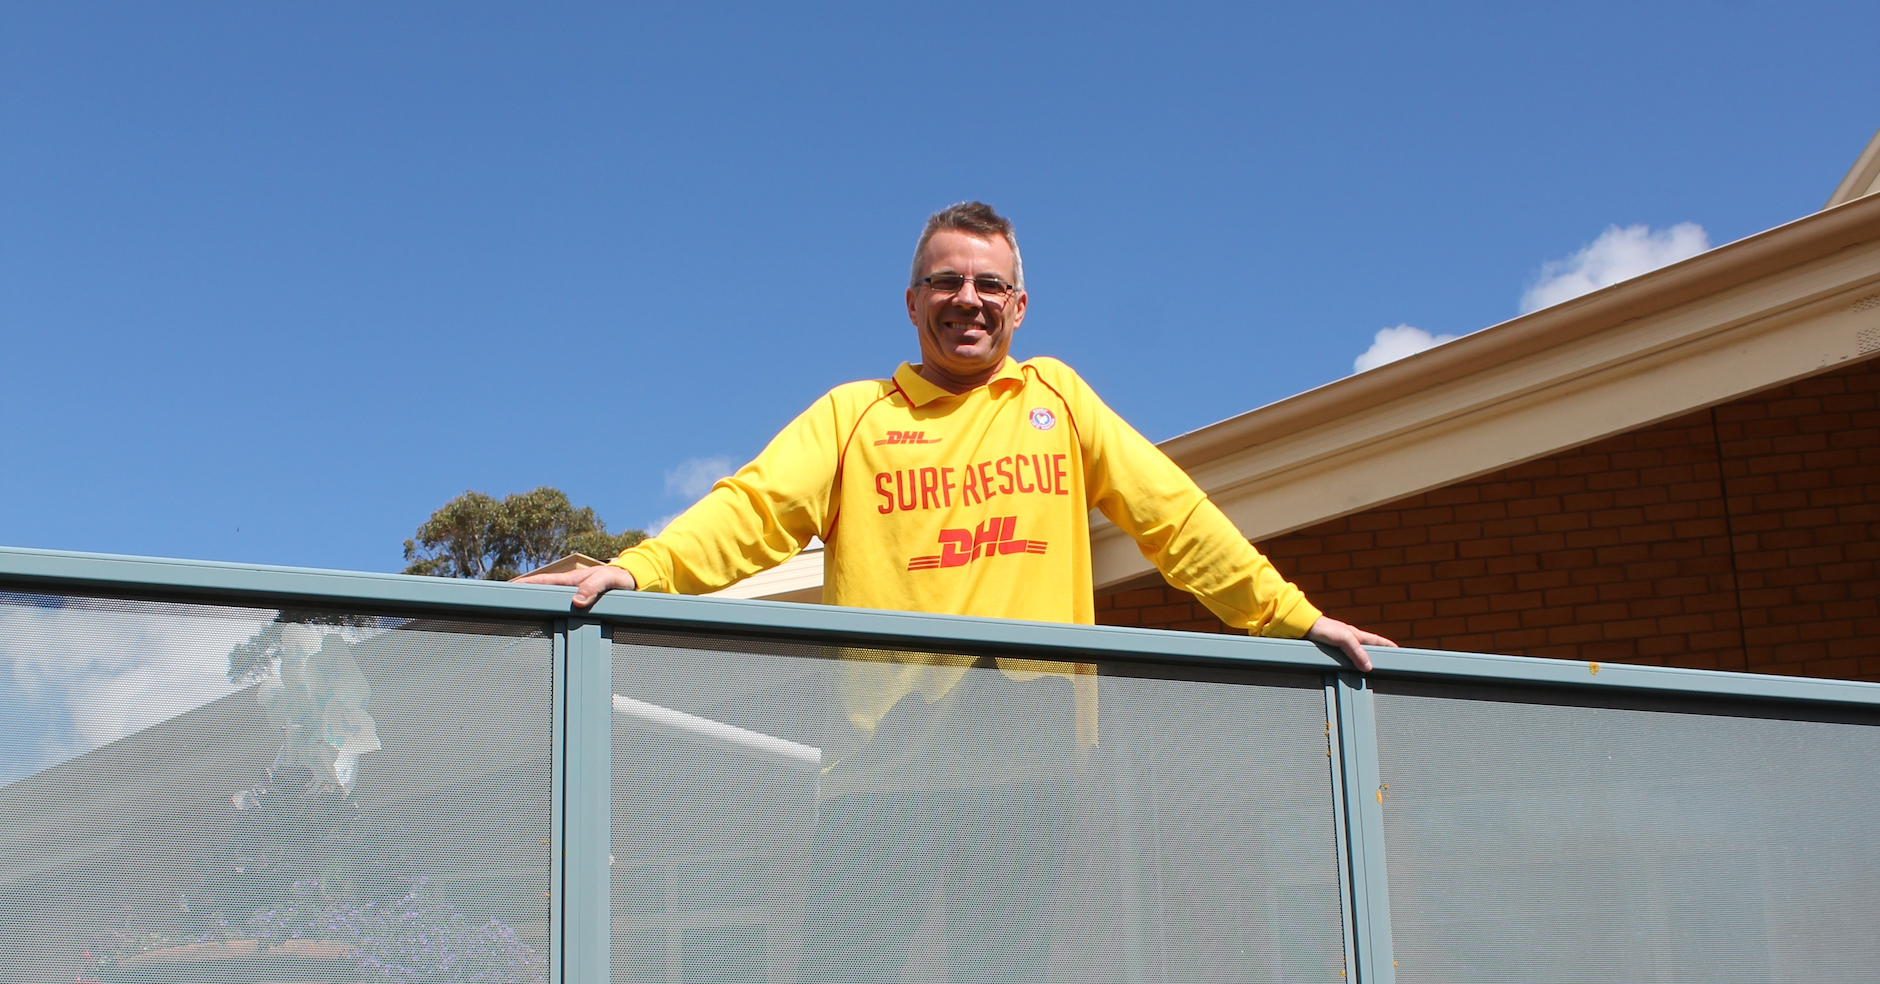 TDHS Port Campbell Surf Life Saving Club Summer Warning